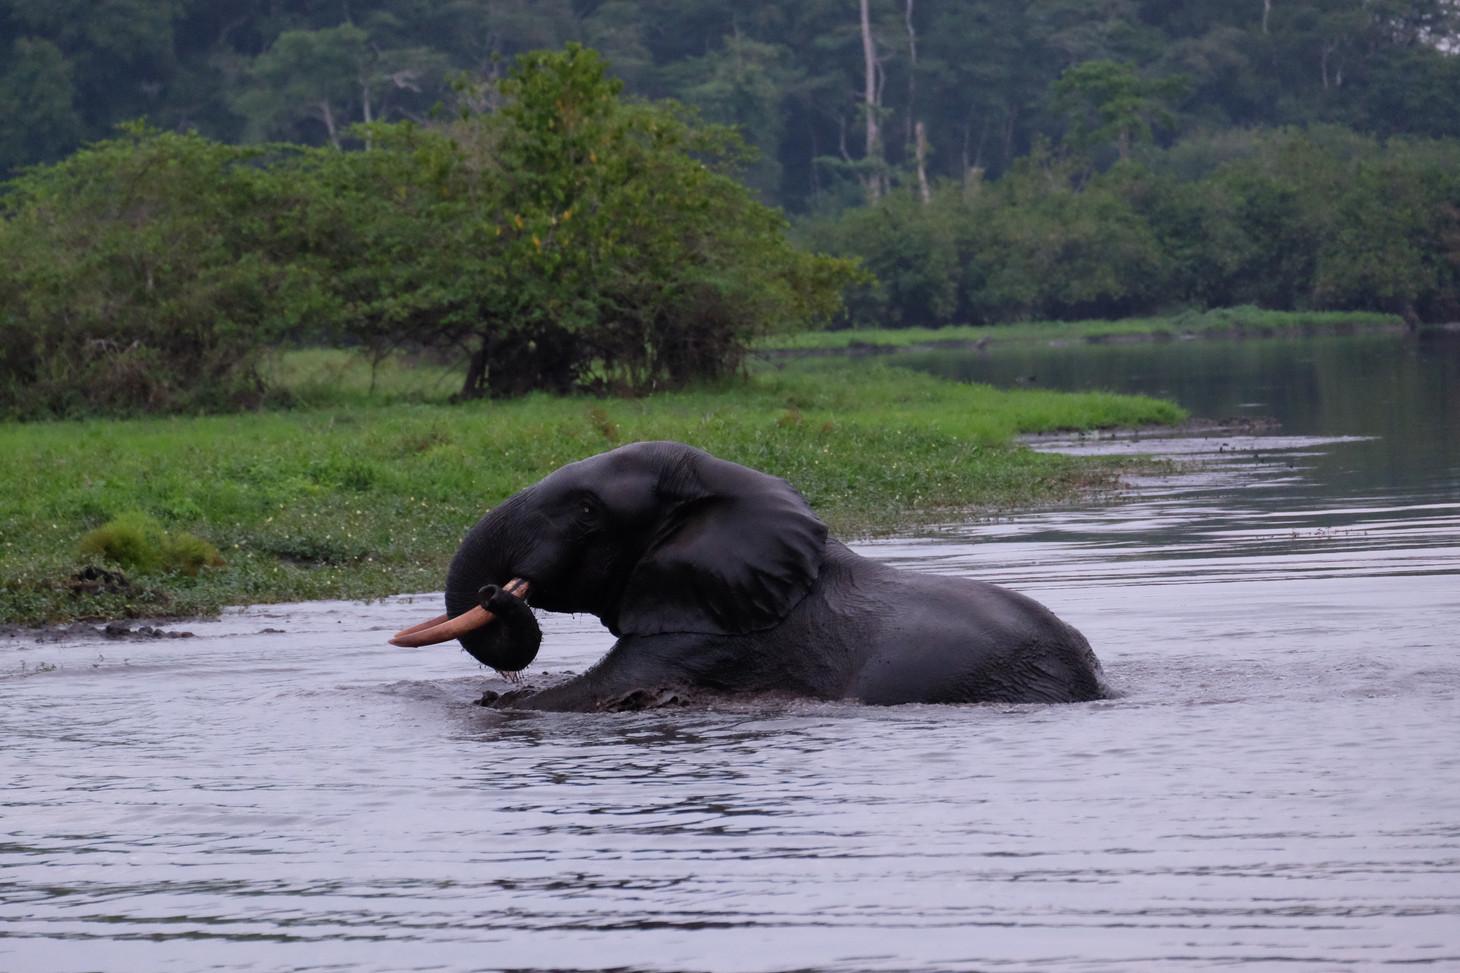 Elephant Crossing Akaka Gabon